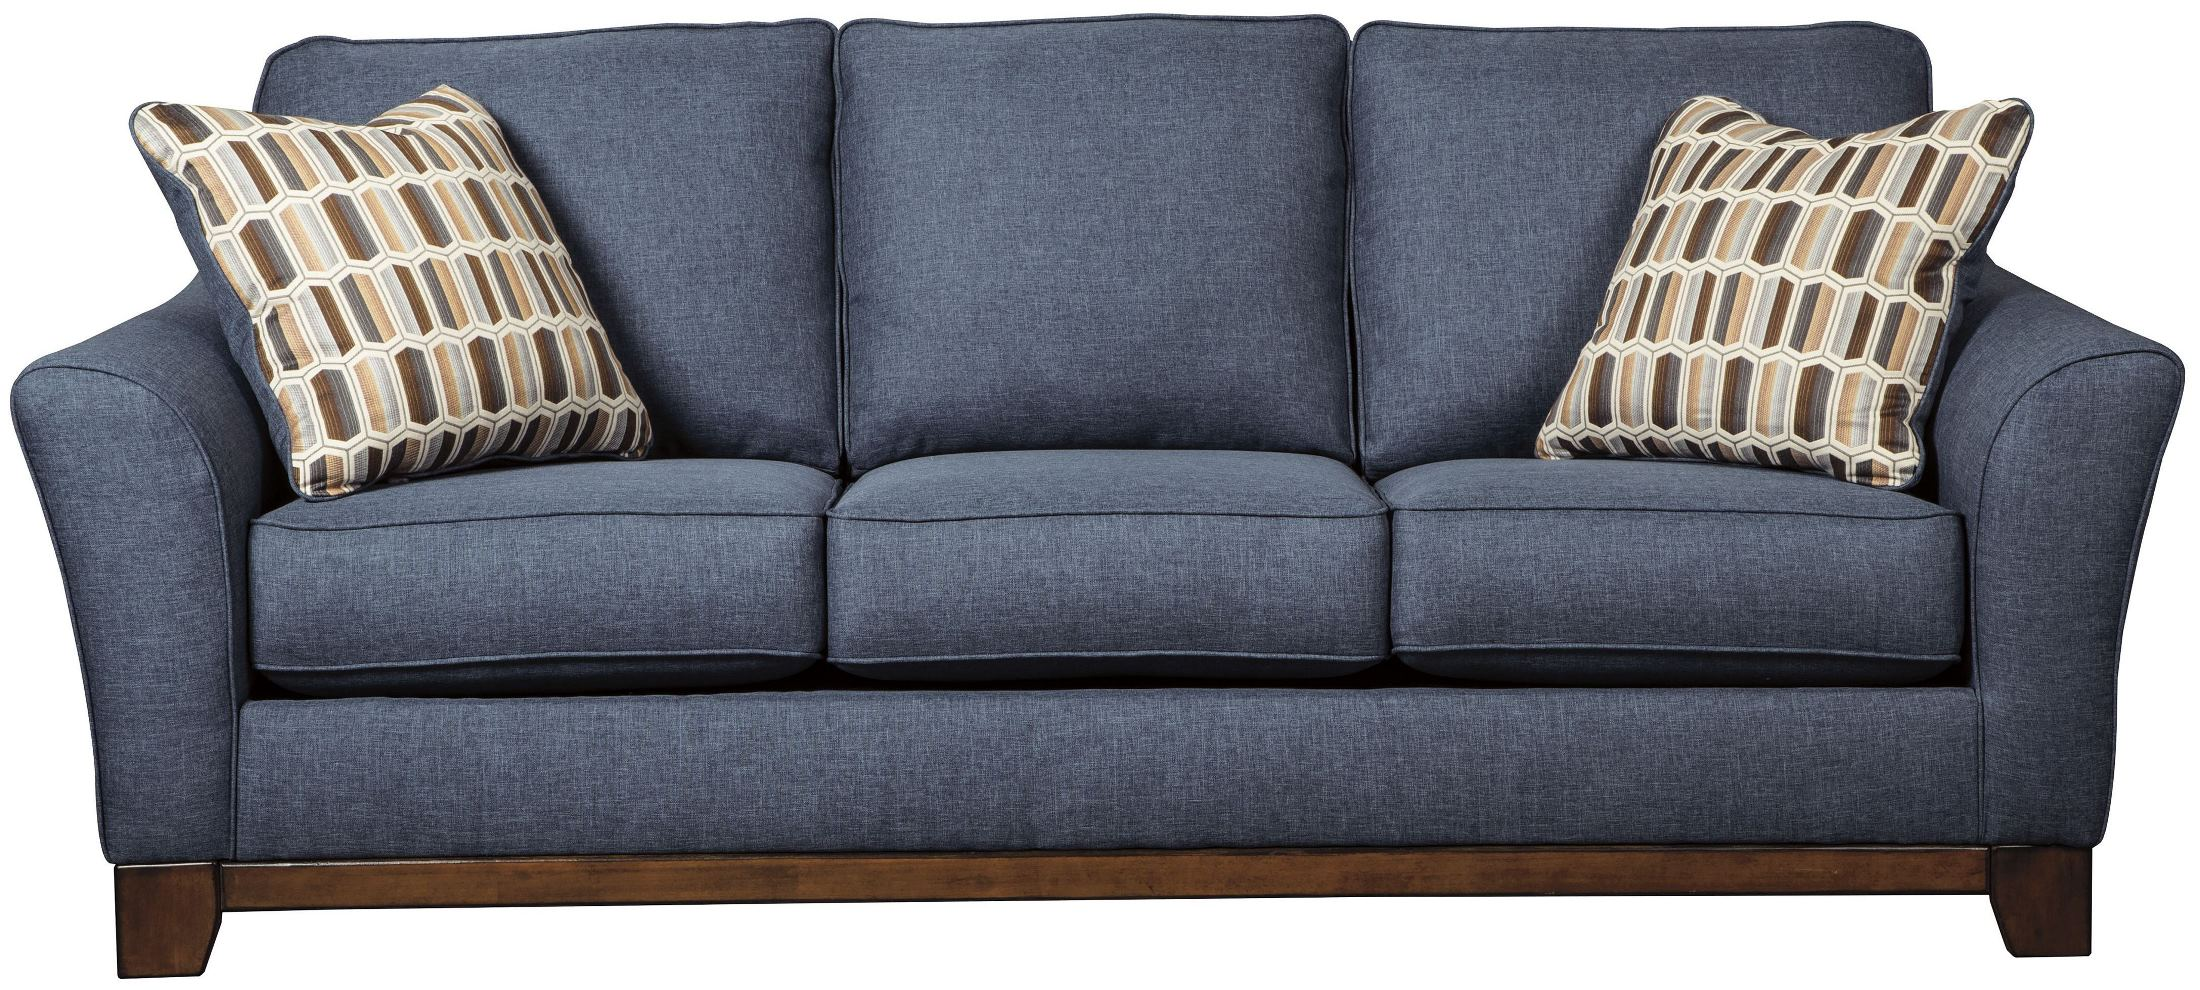 janley denim sofa LYTUELG